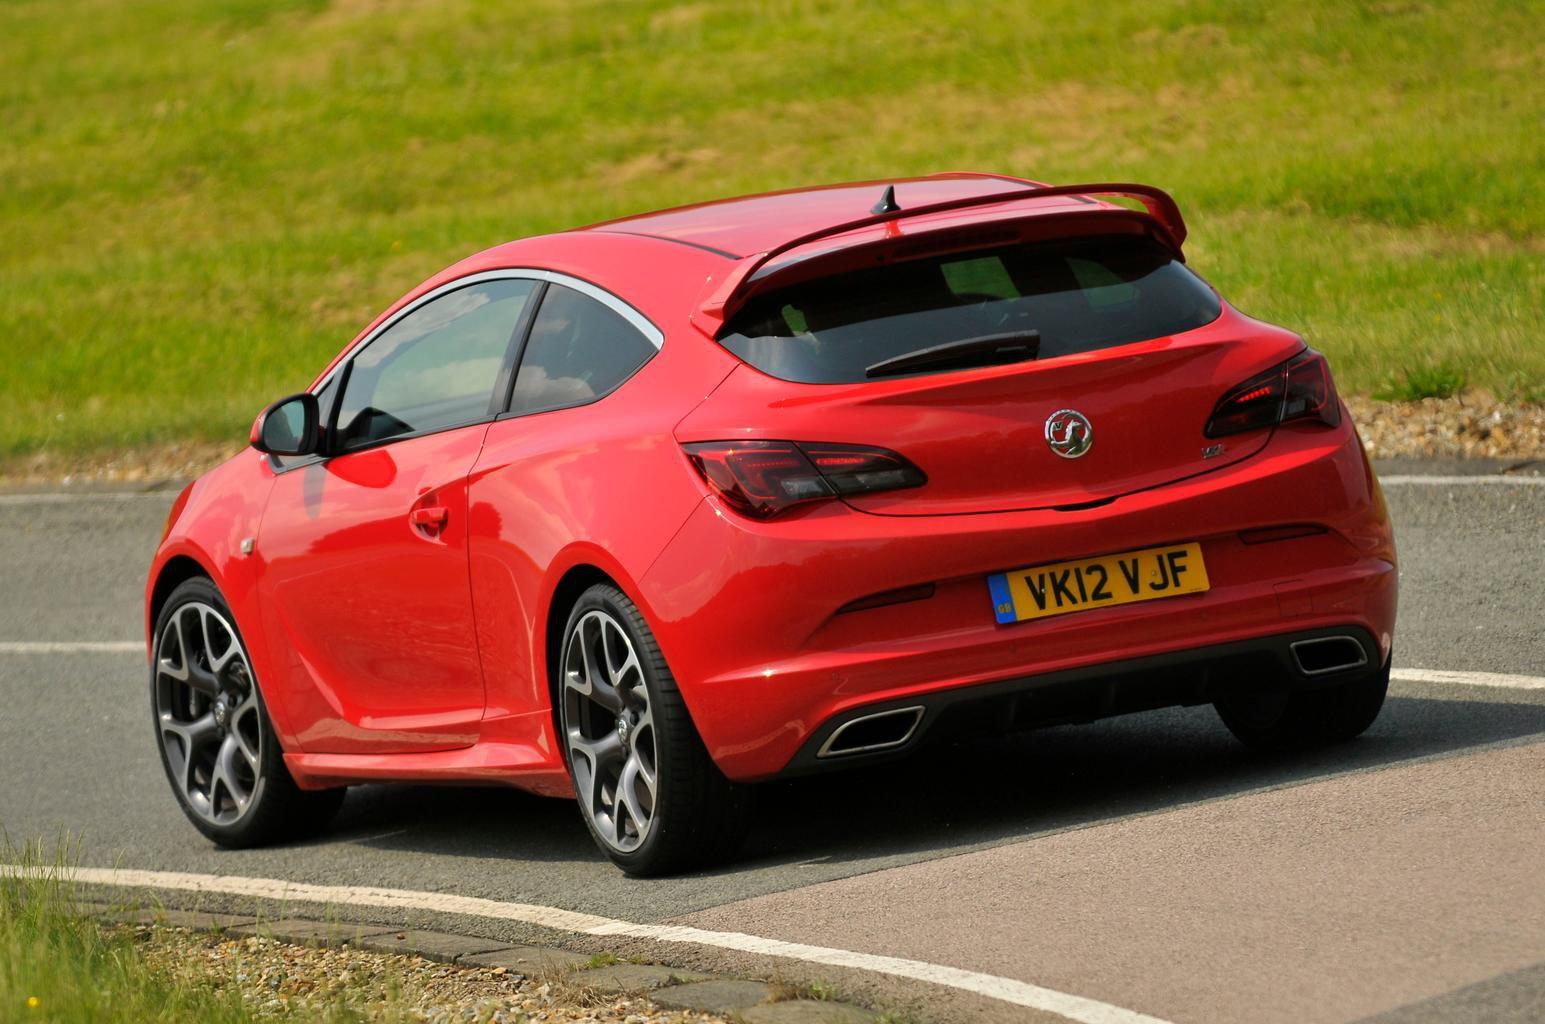 Used test – hot hatches: Renault Sport Megane vs Vauxhall Astra VXR